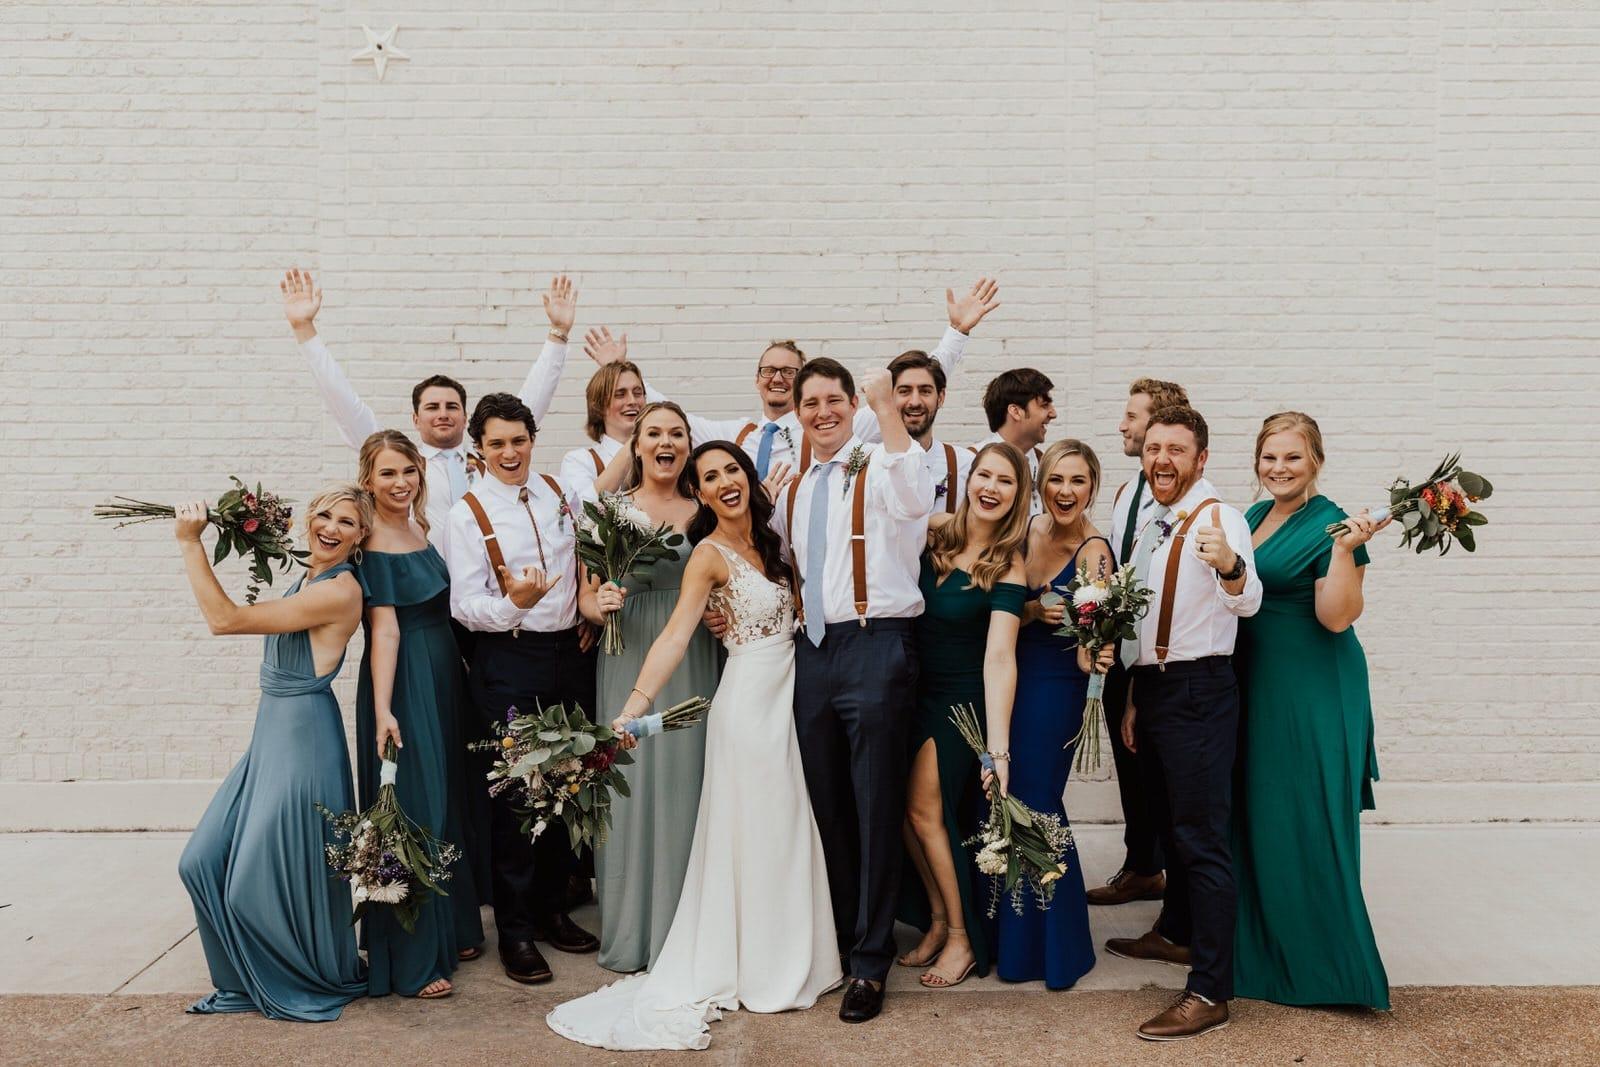 StLouis-Wedding-Photographer-EmmaTom-Portraits173-large